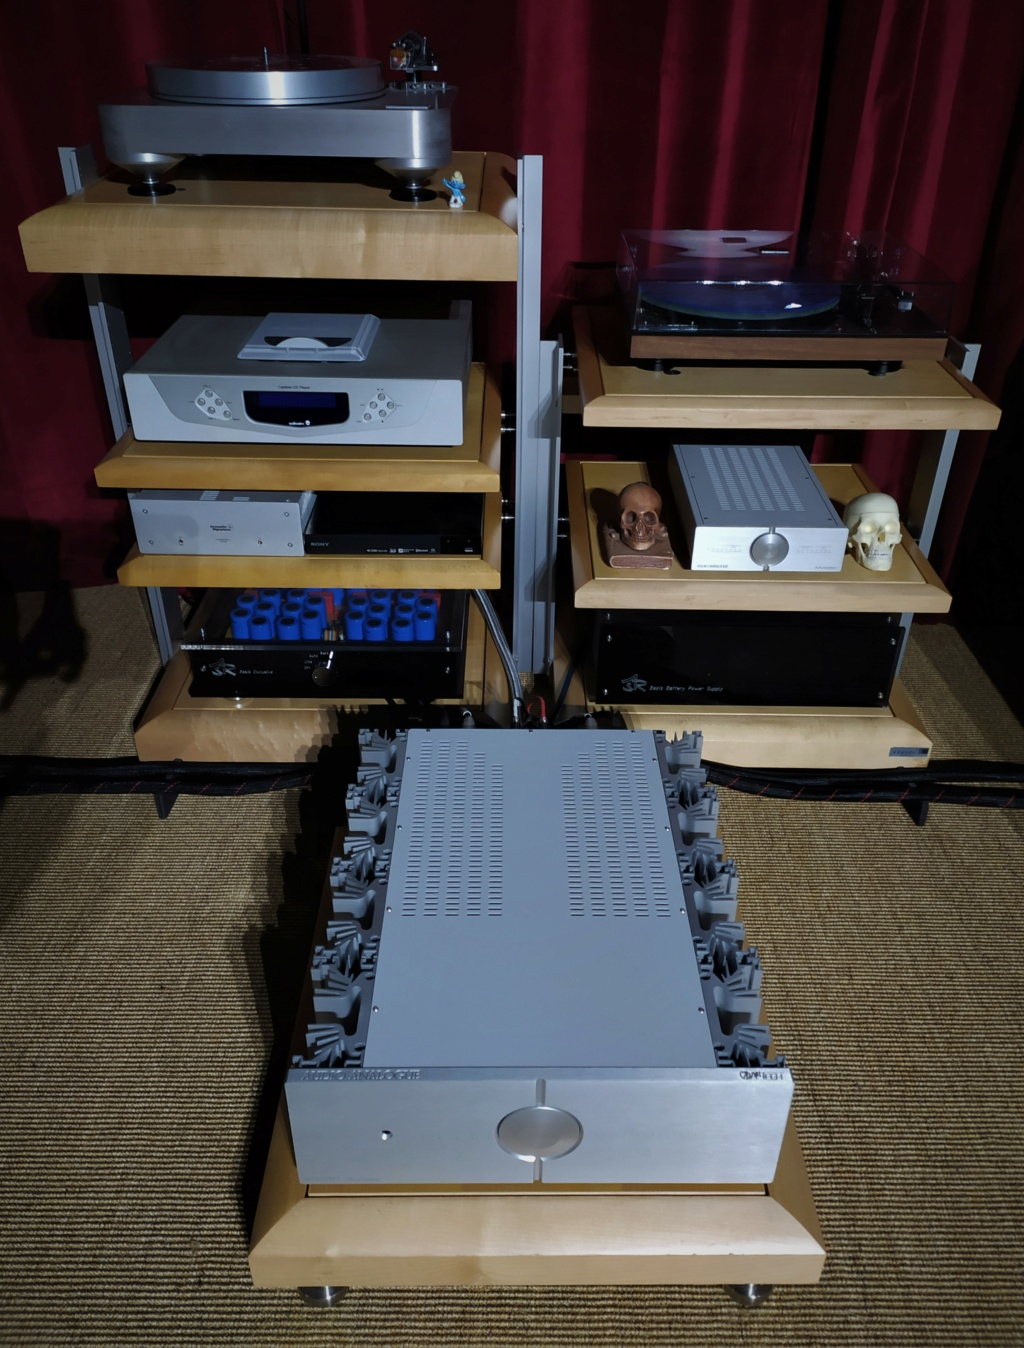 McIntosh MA9000 vs Lavardin ITx vs Audio Analogue Maestro Anniversary Img_2055